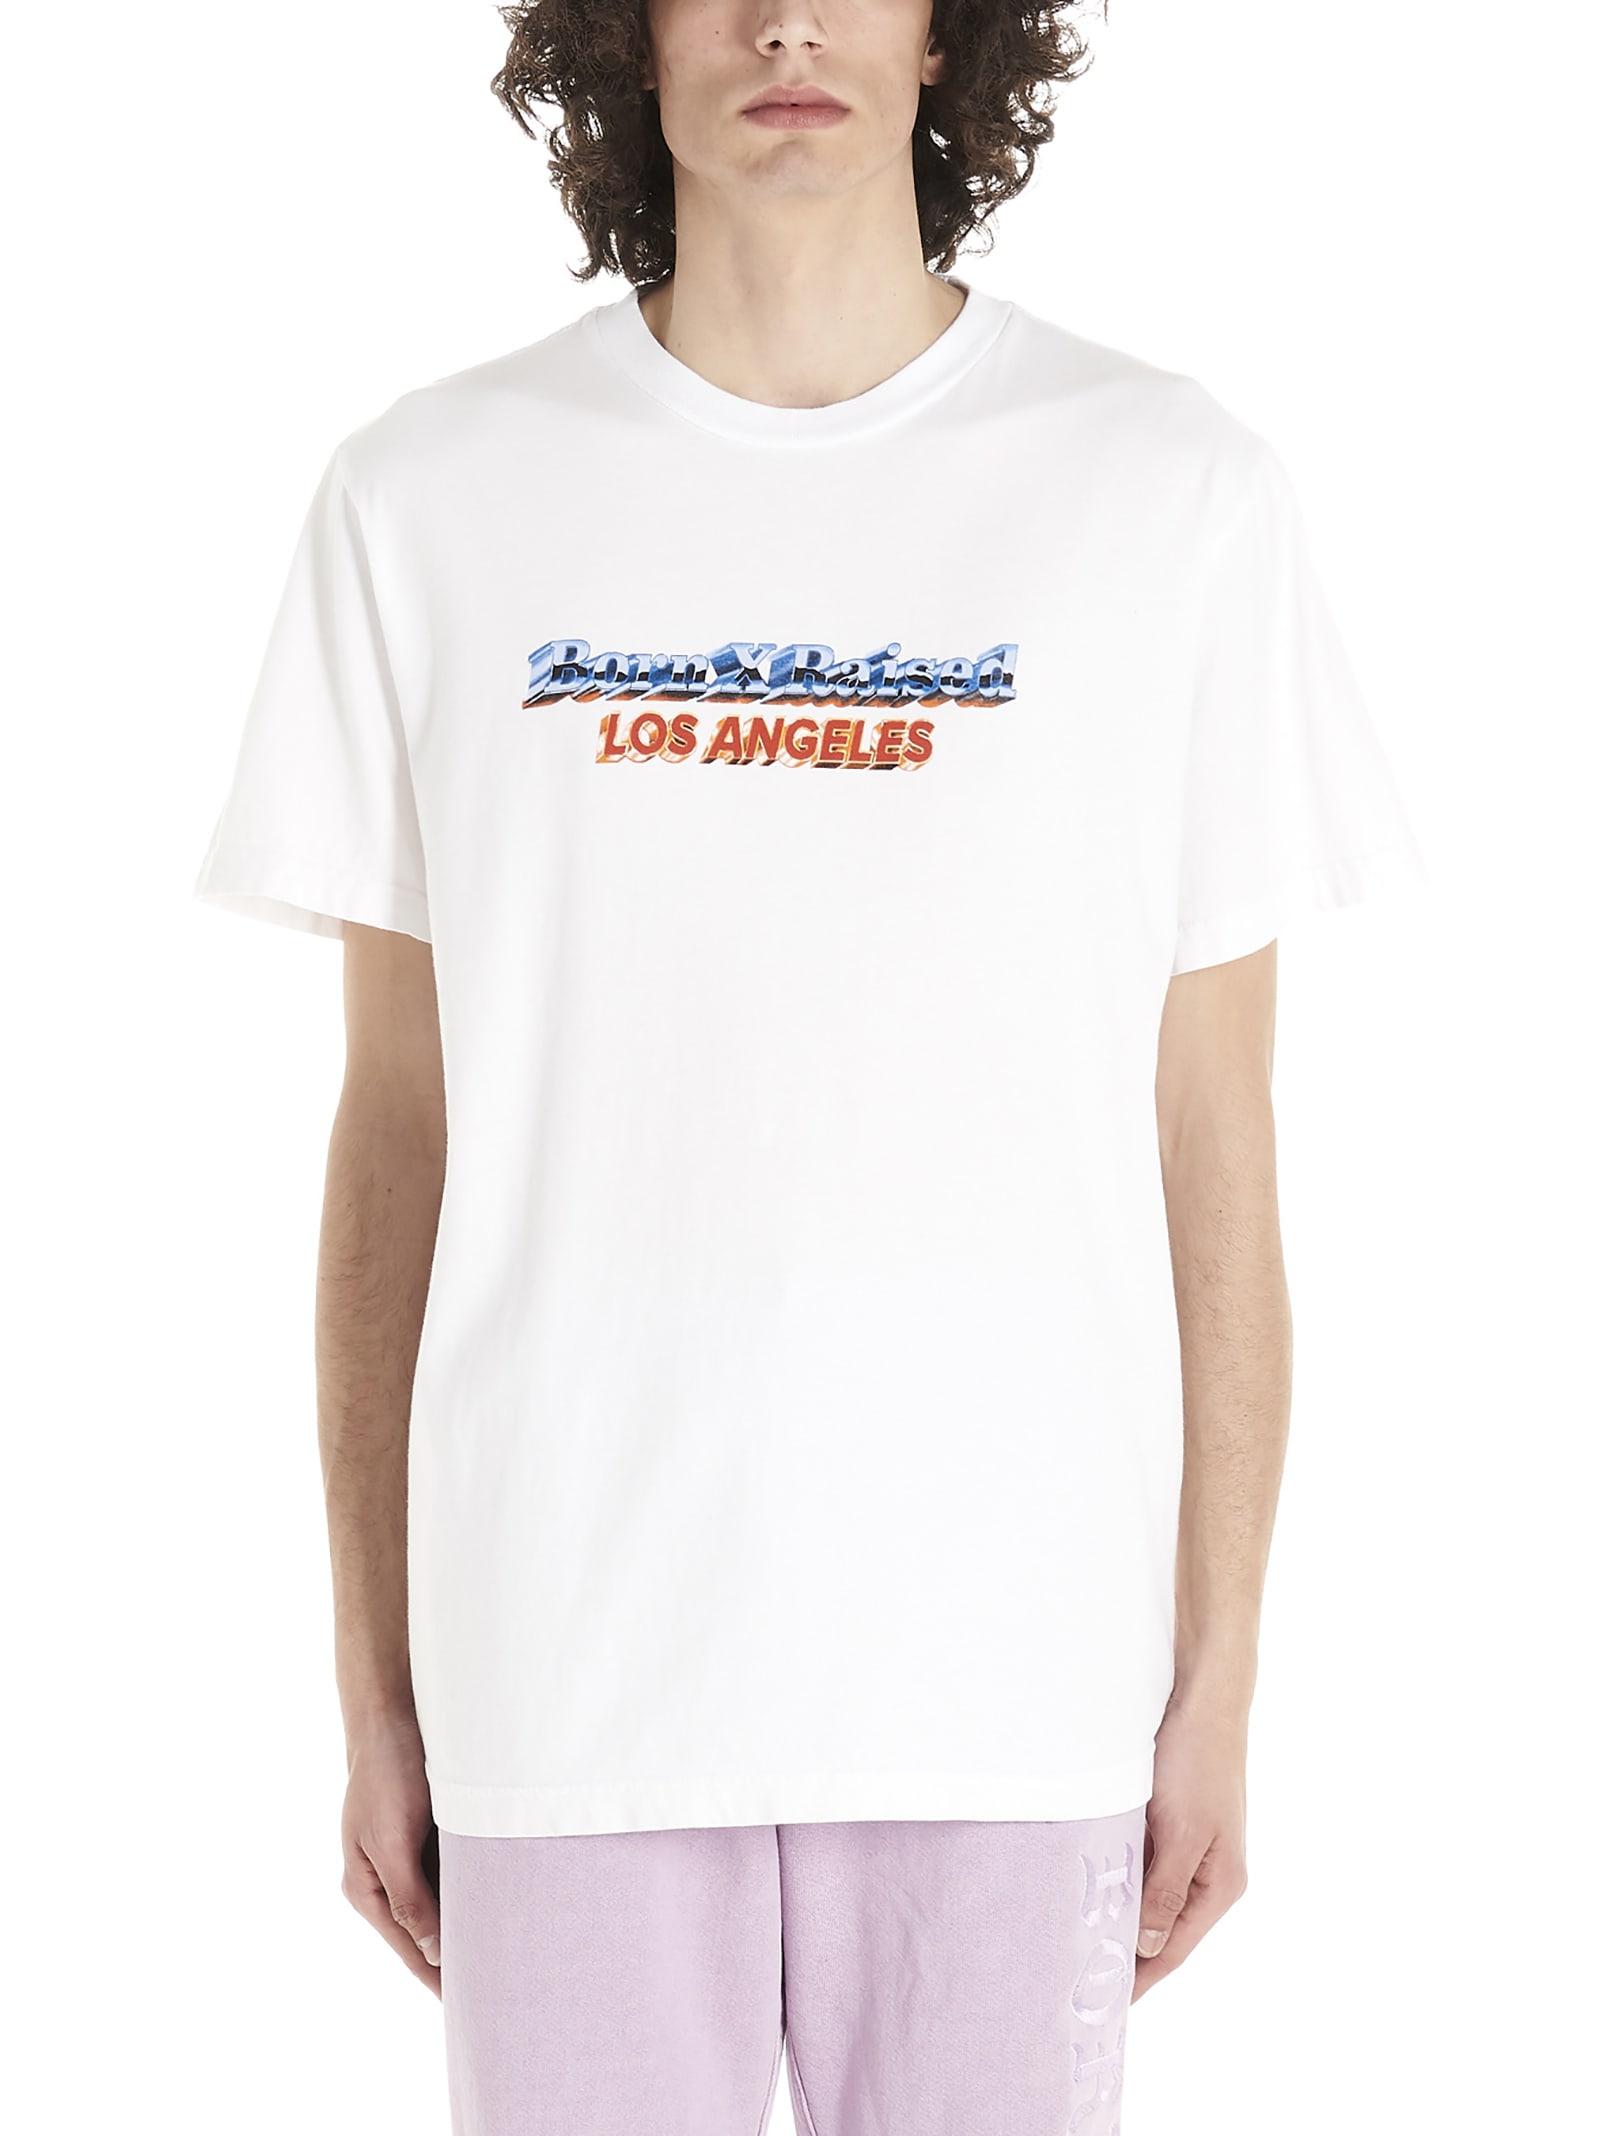 Bornxraised chrome T-shirt